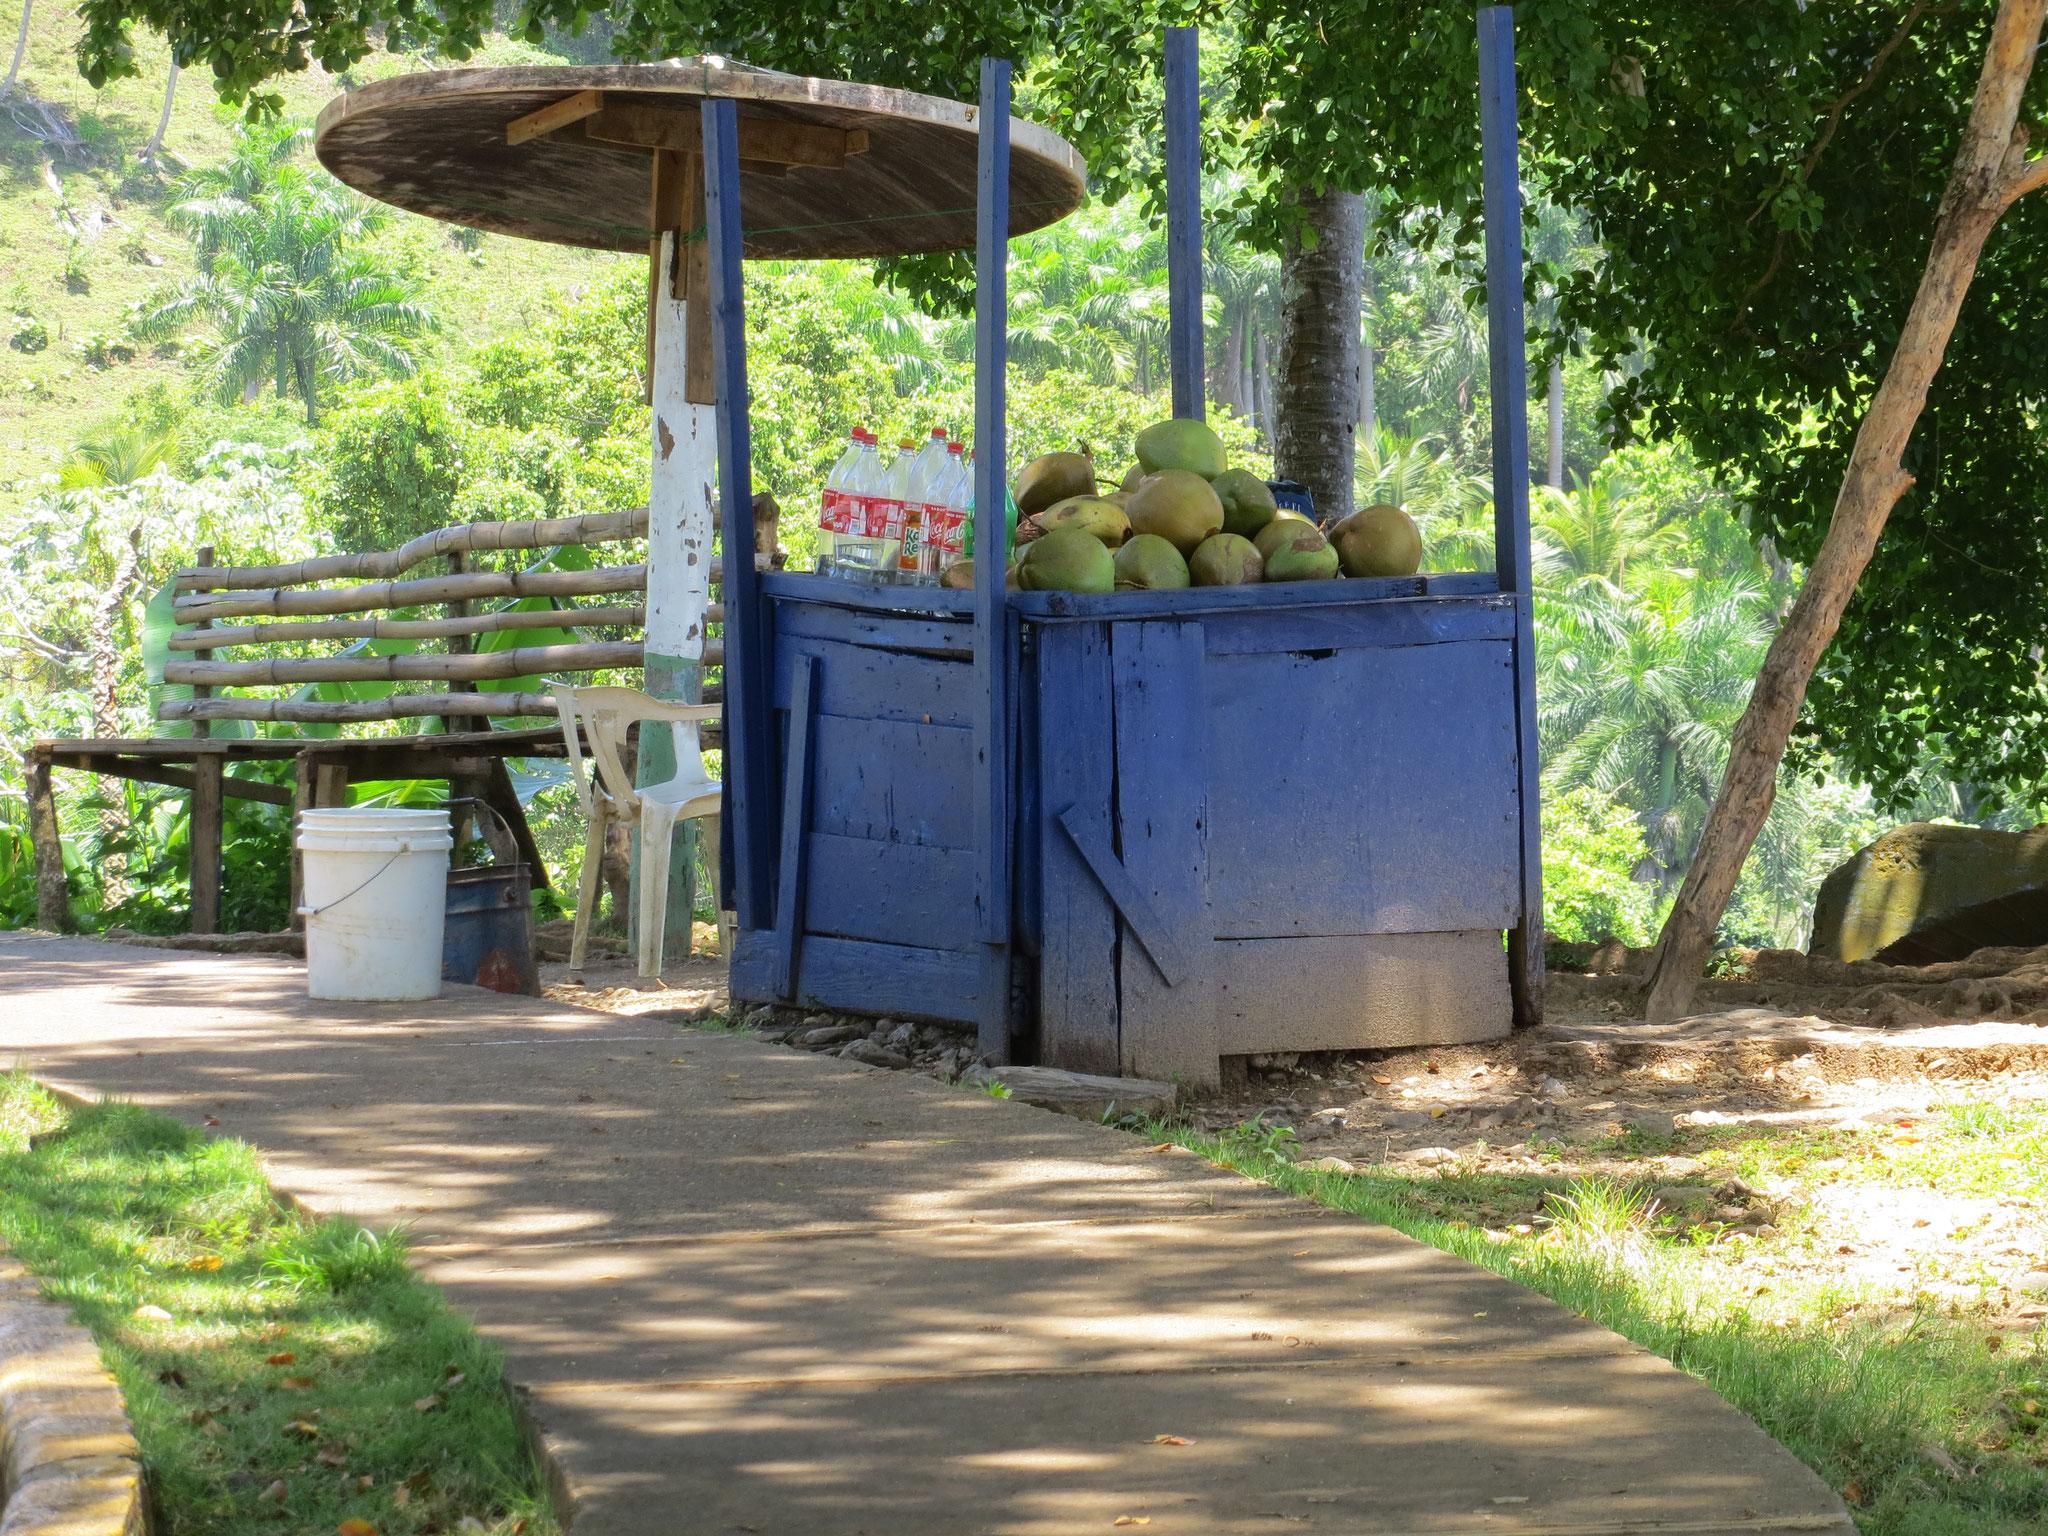 Kokoswasser-Stand